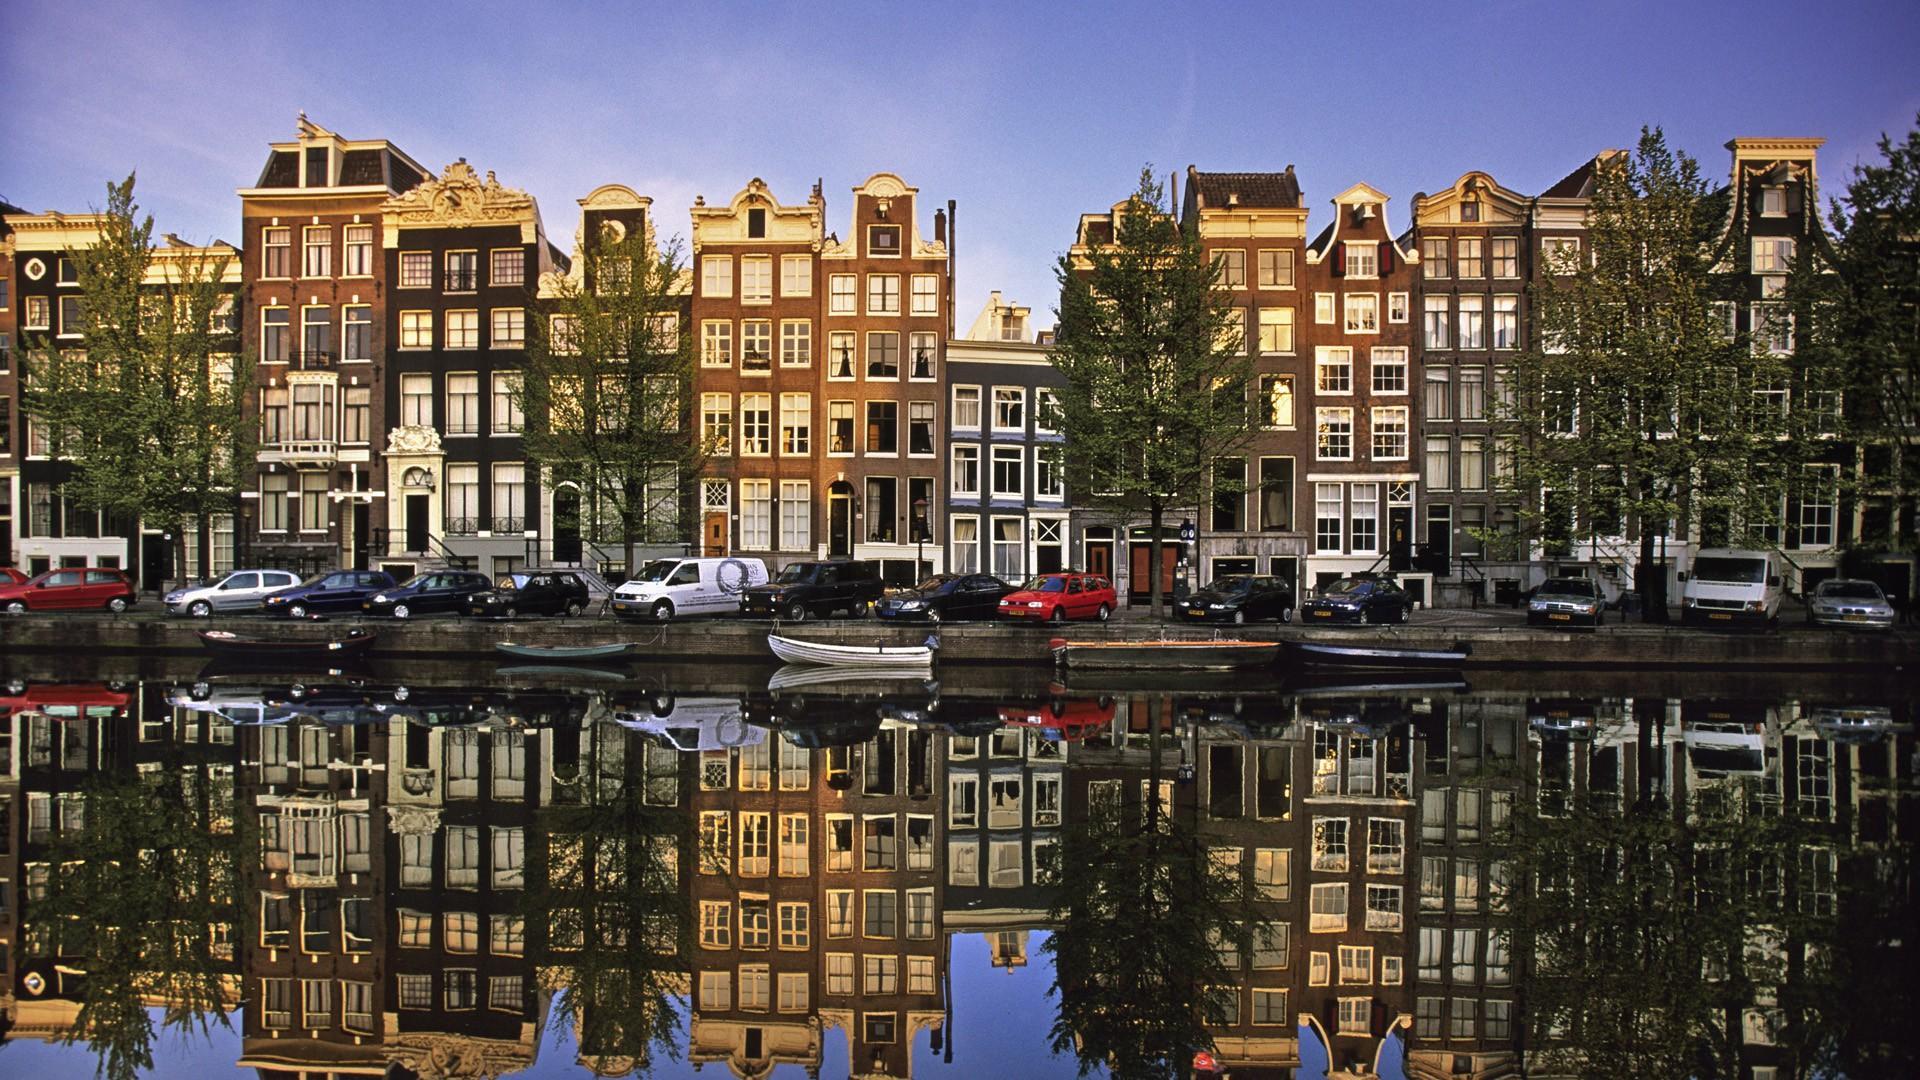 beautiful amsterdam wide hd wallpaper